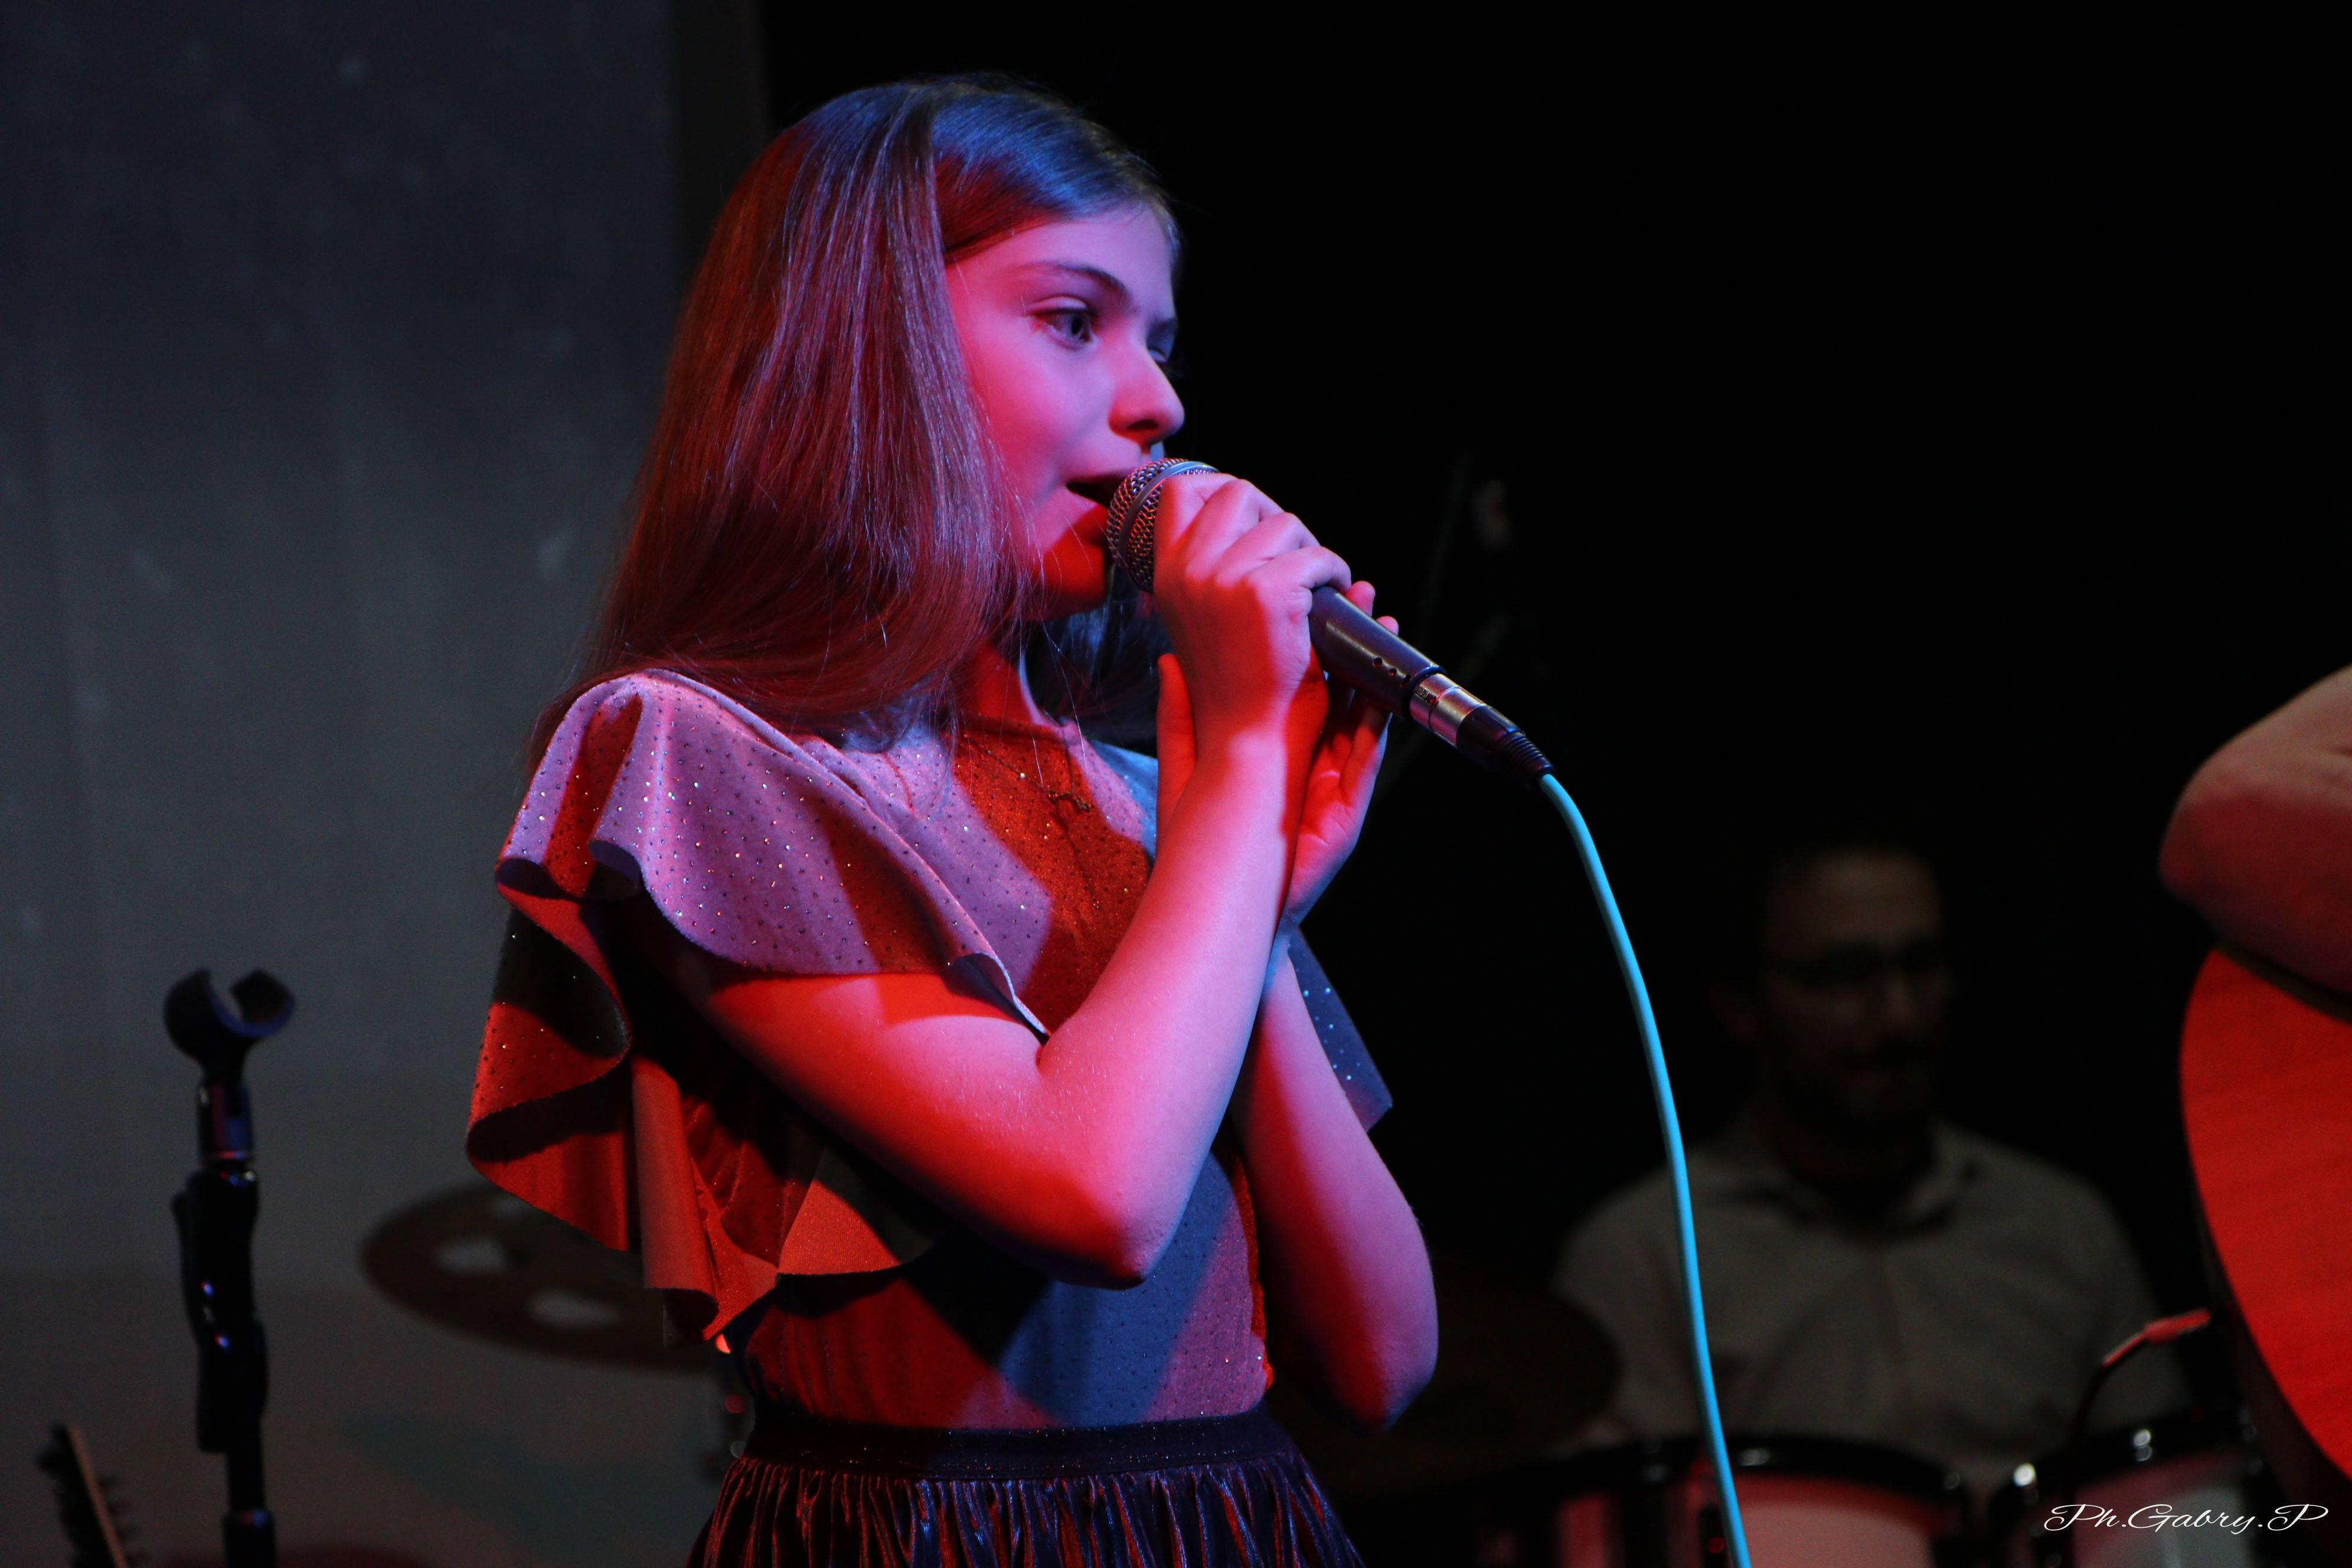 IVY Elisa Tribute Band